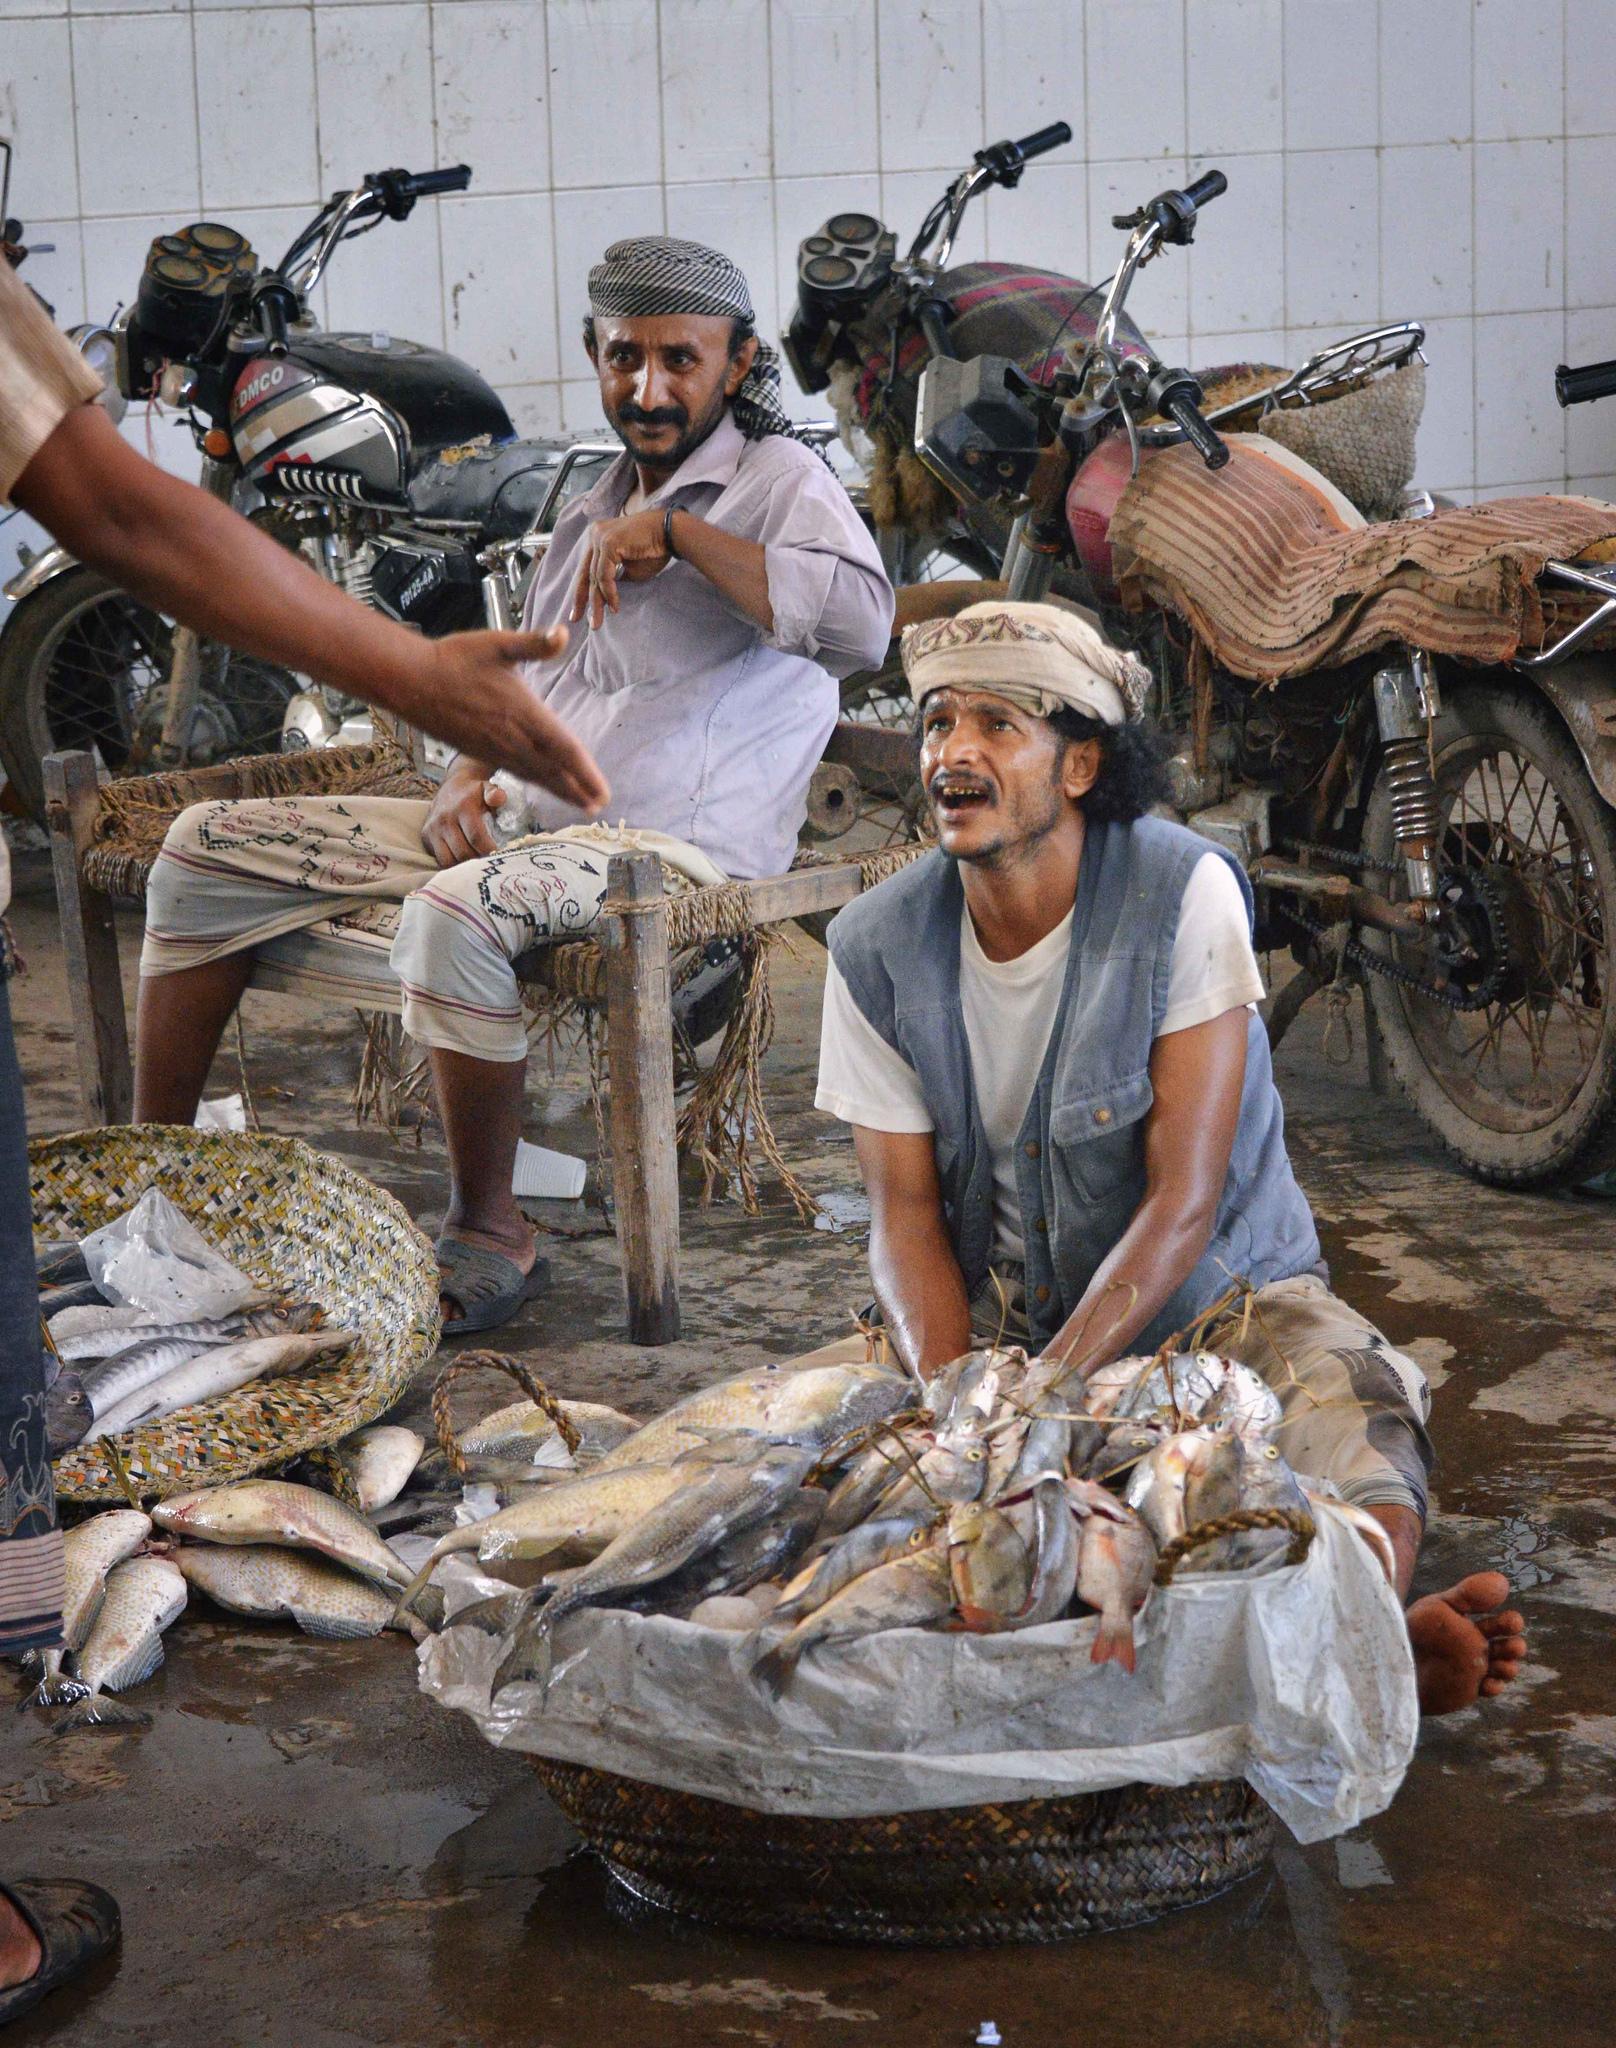 Penjual ikan di Pasar Ikan di Yemen. Flickr - Rod Waddington.